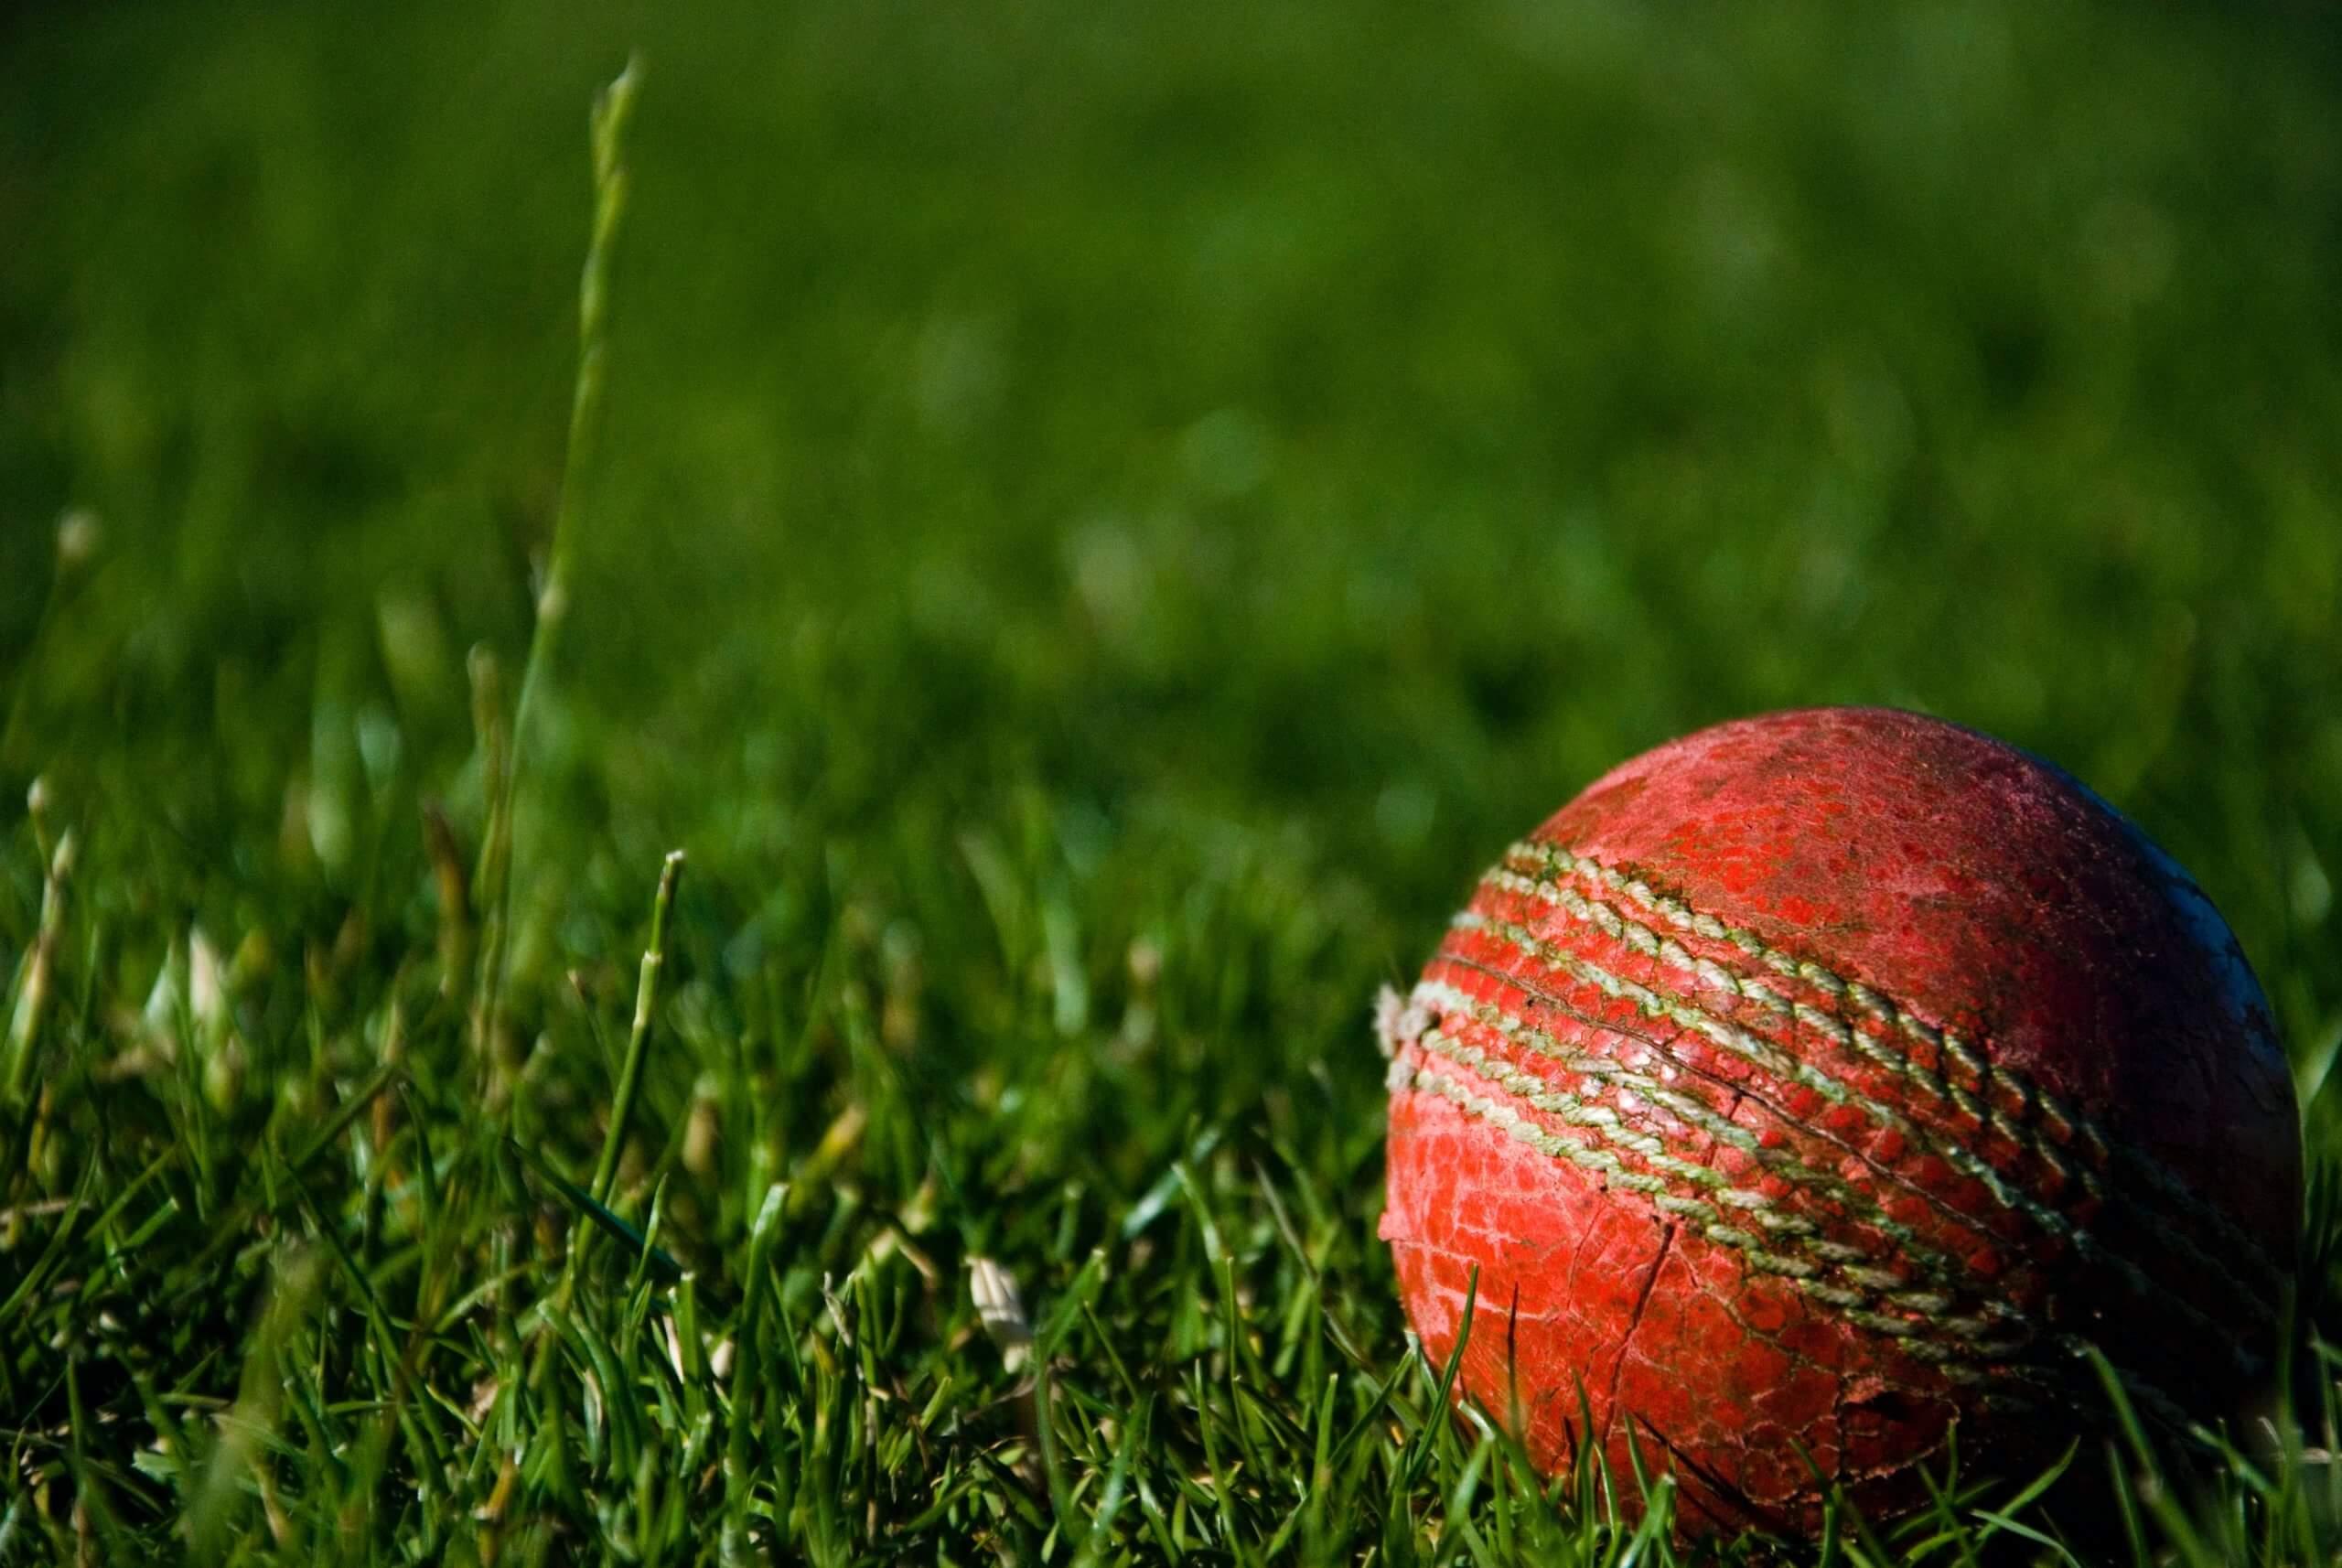 Cricket: India Vs England 2021 Test Series